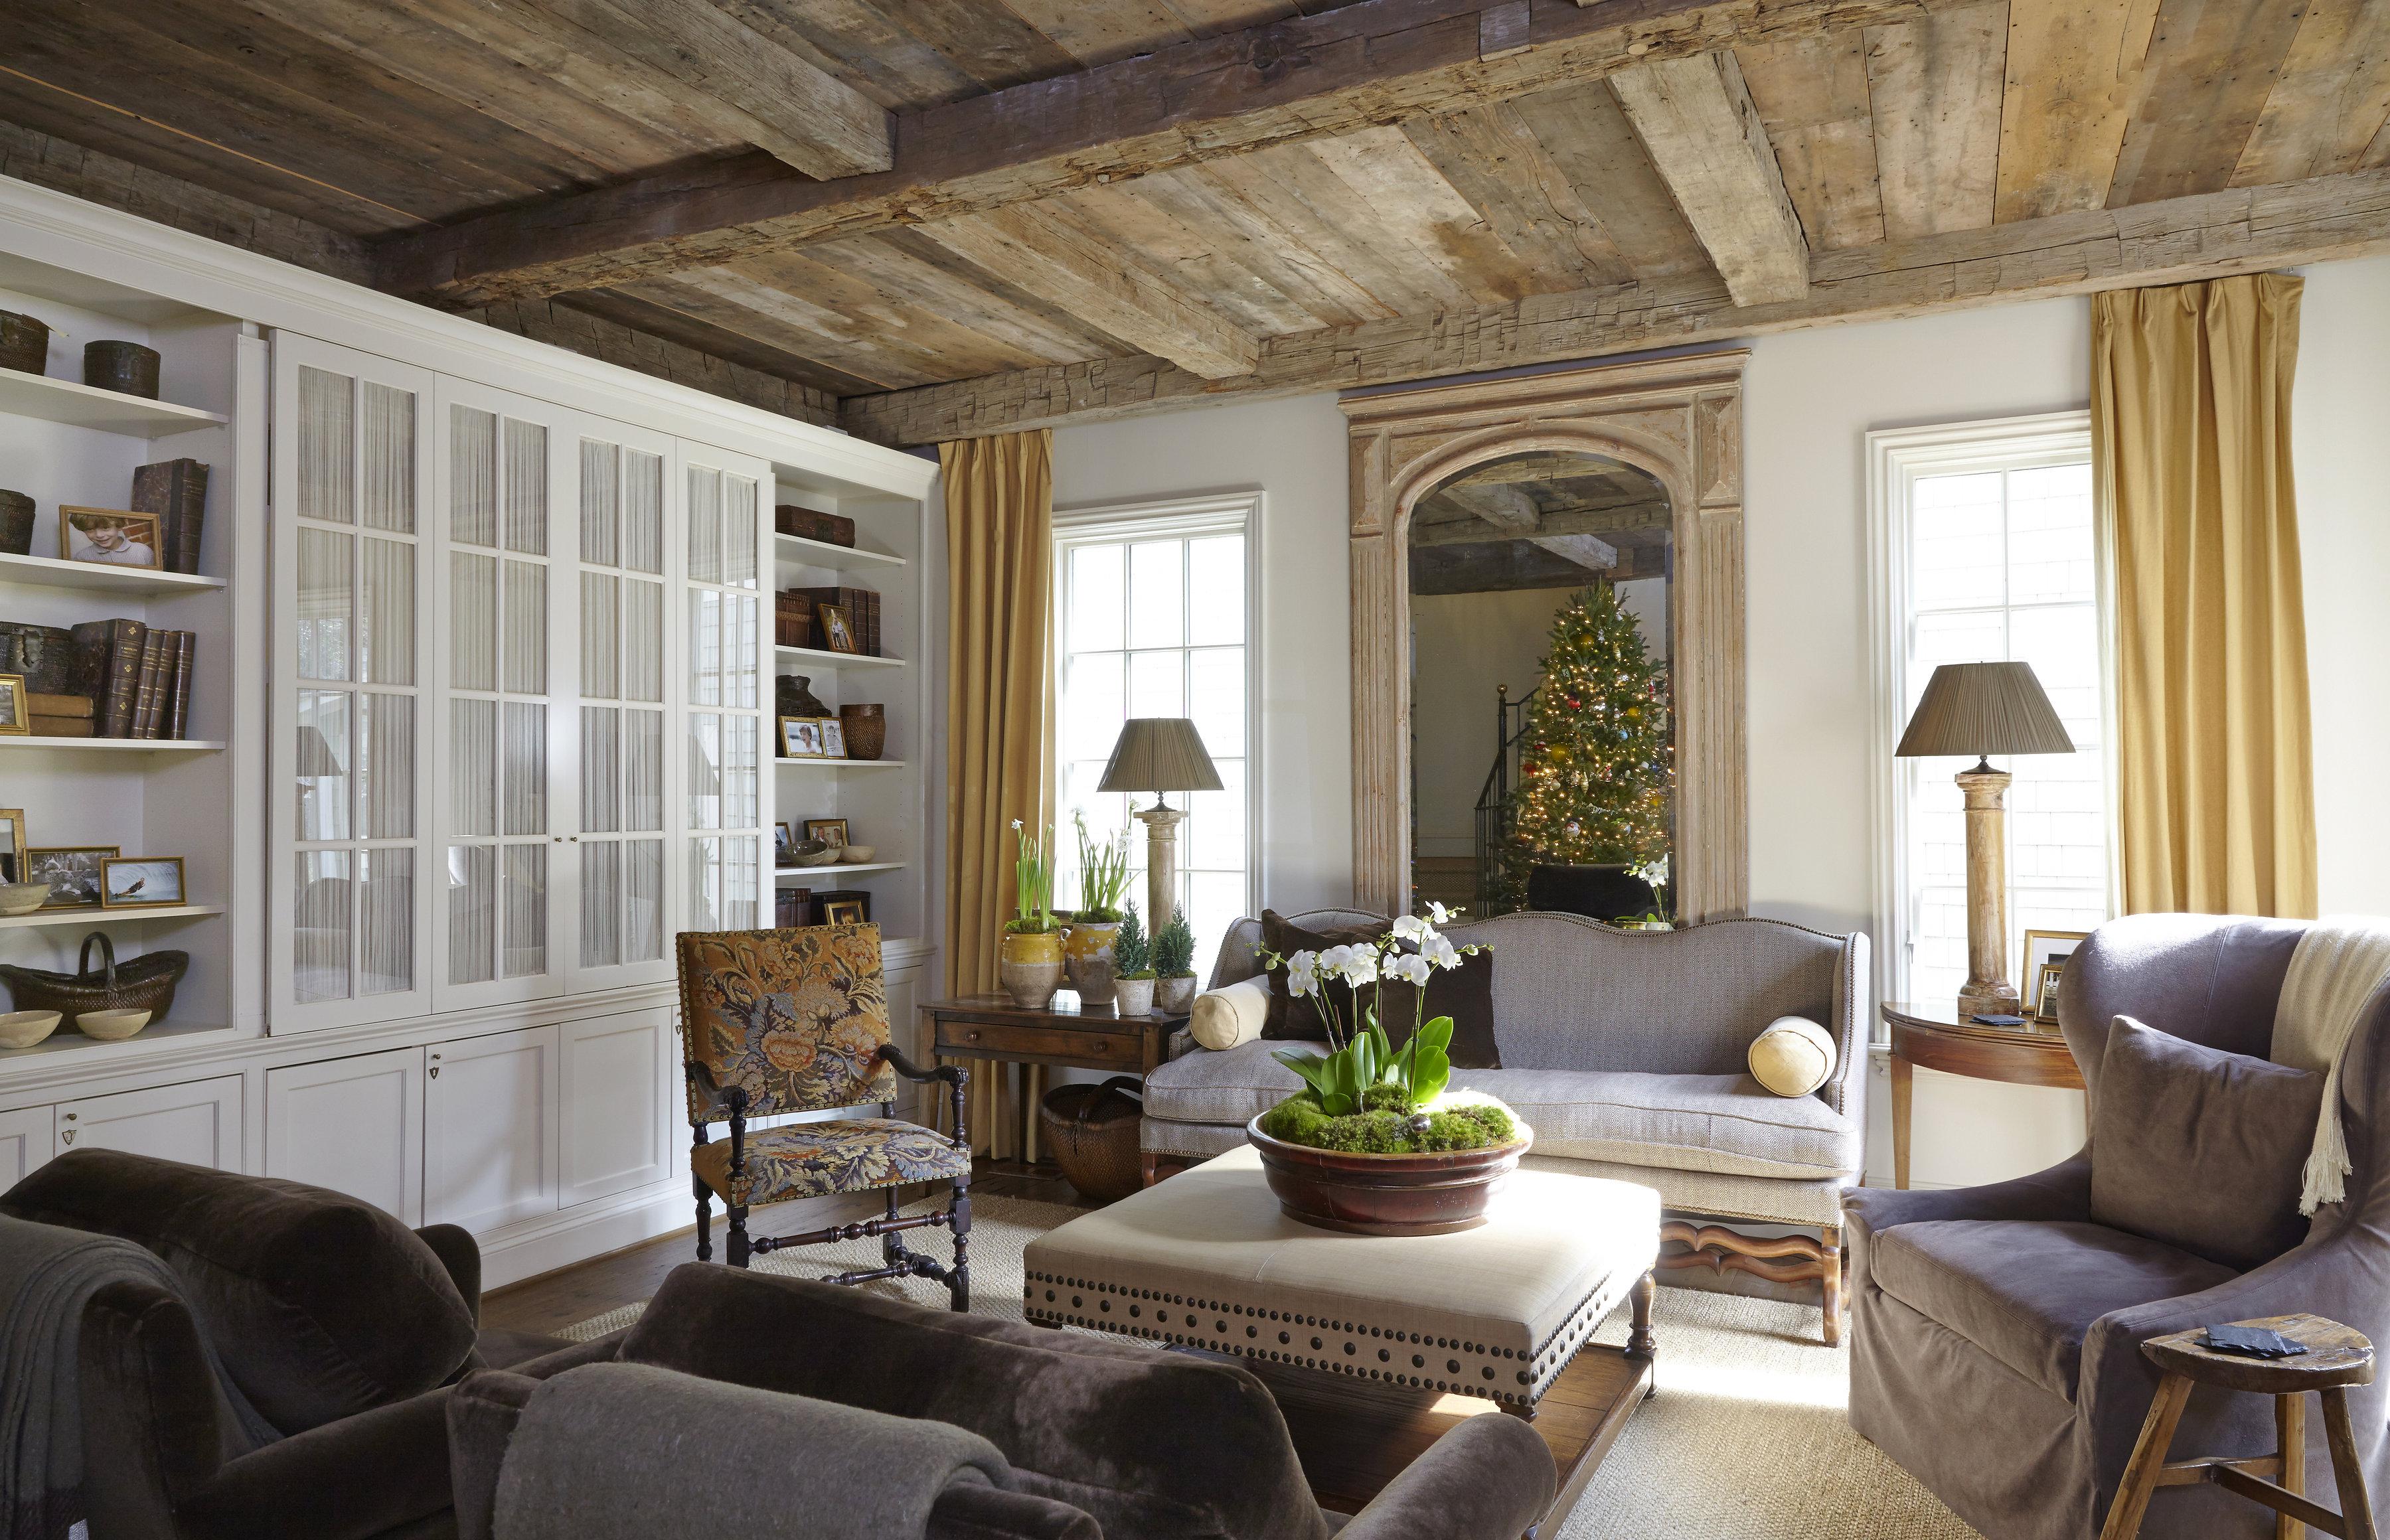 Birmingham al interior design firms interiorhalloween co for Interior decorators birmingham al